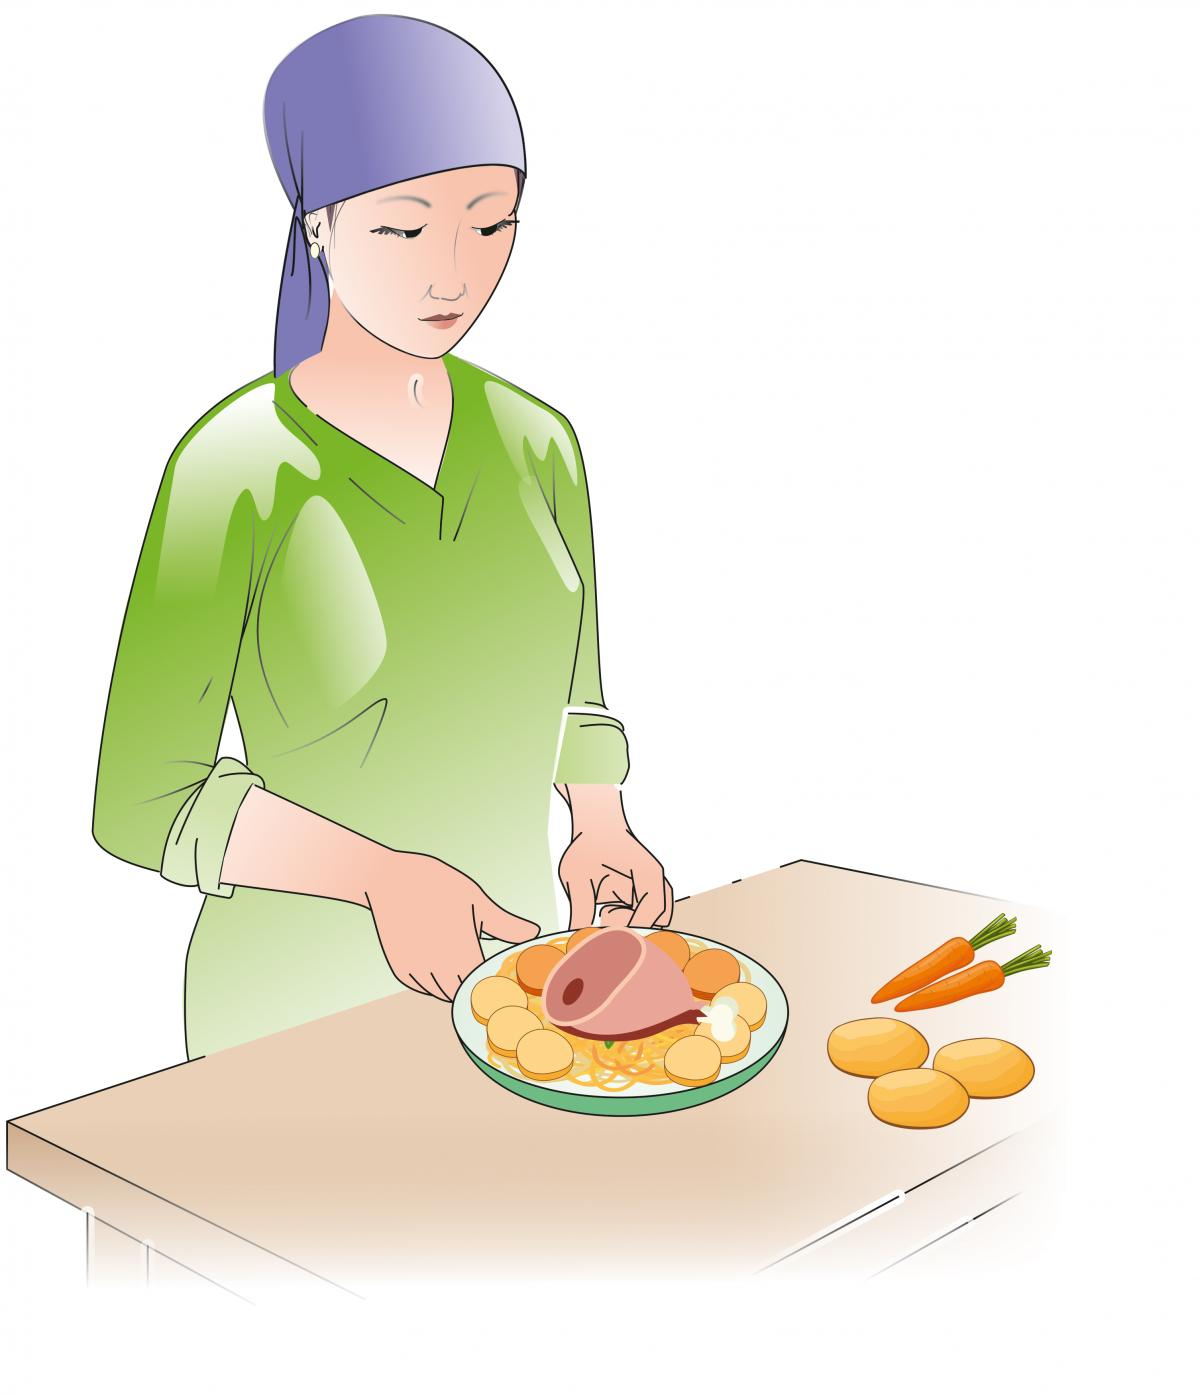 Food Practices - Woman preparing food hygienically  - 01 - Kyrgyz Republic